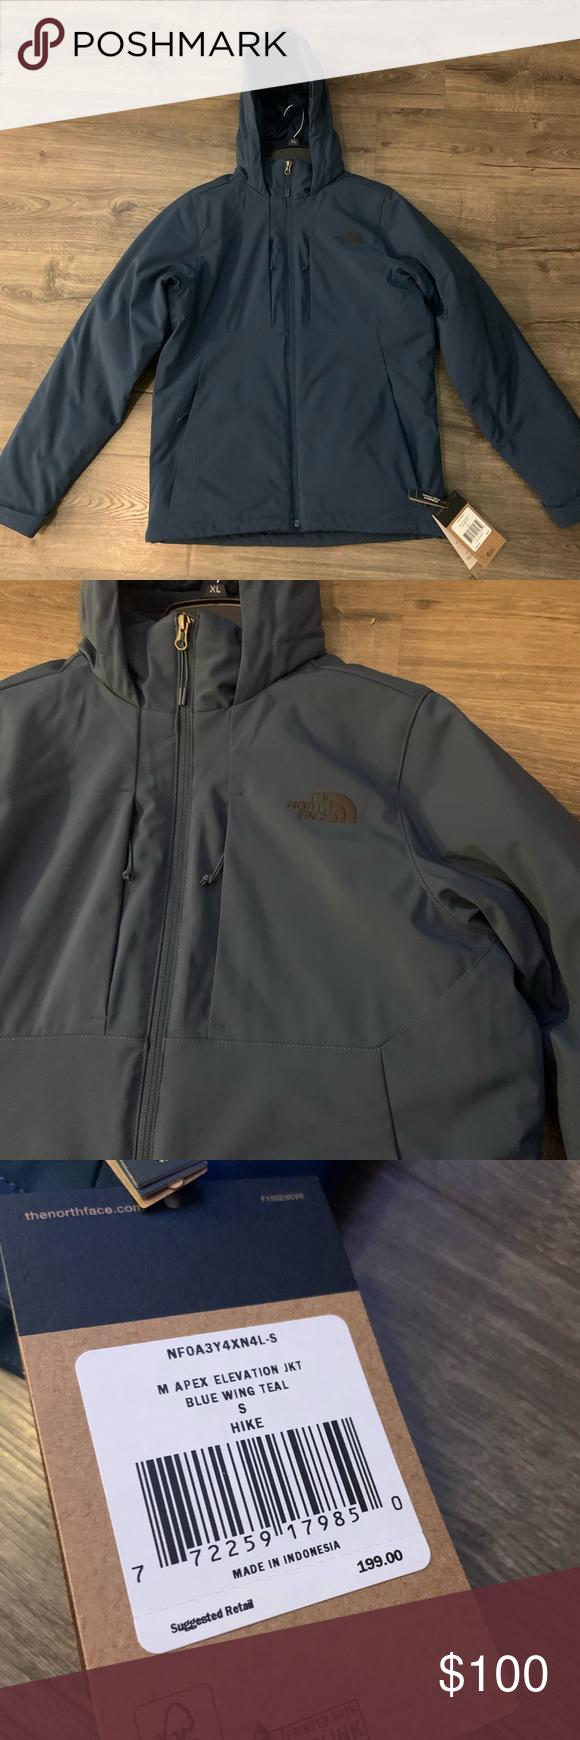 The Northface Men S Apex Elevation Jacket Small Jackets The North Face North Face Jacket [ 1740 x 580 Pixel ]